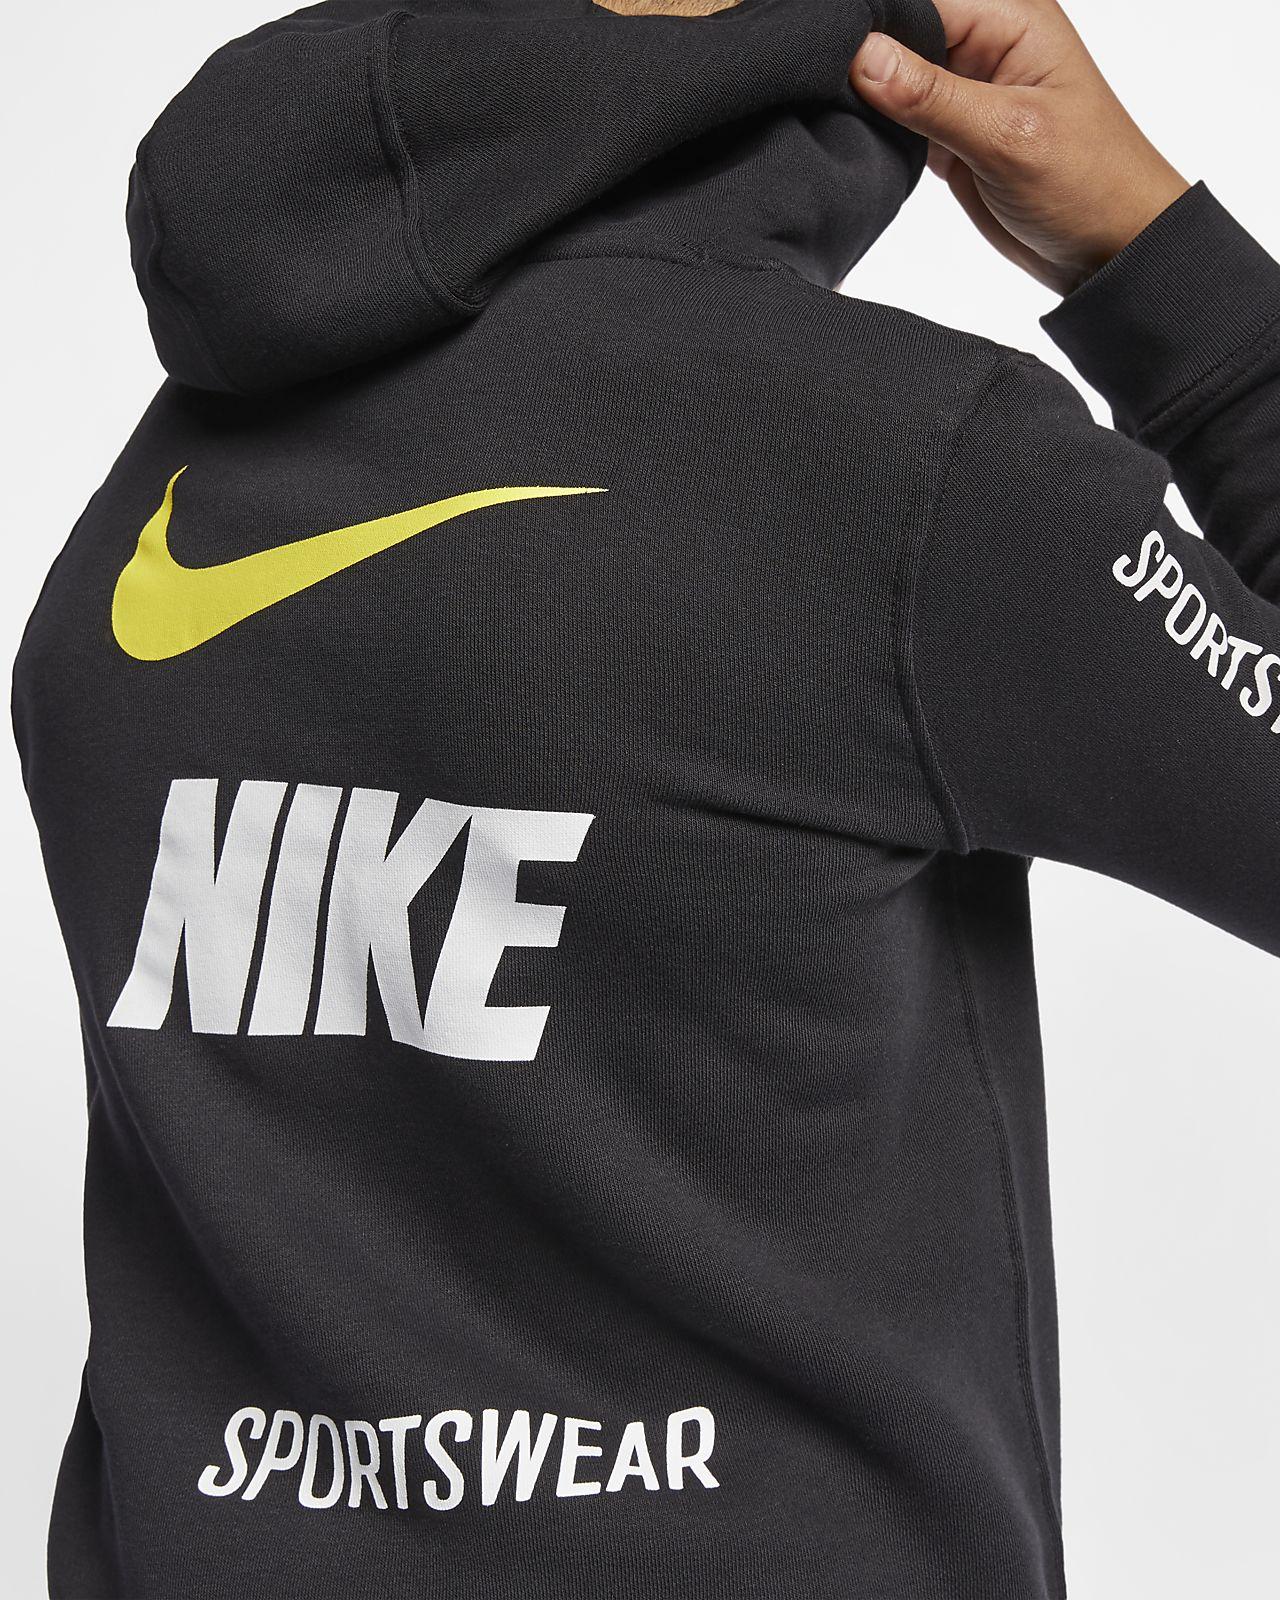 8a498d9d455297 Nike Sportswear Club Fleece Big Kids  (Boys ) Pullover Hoodie. Nike.com